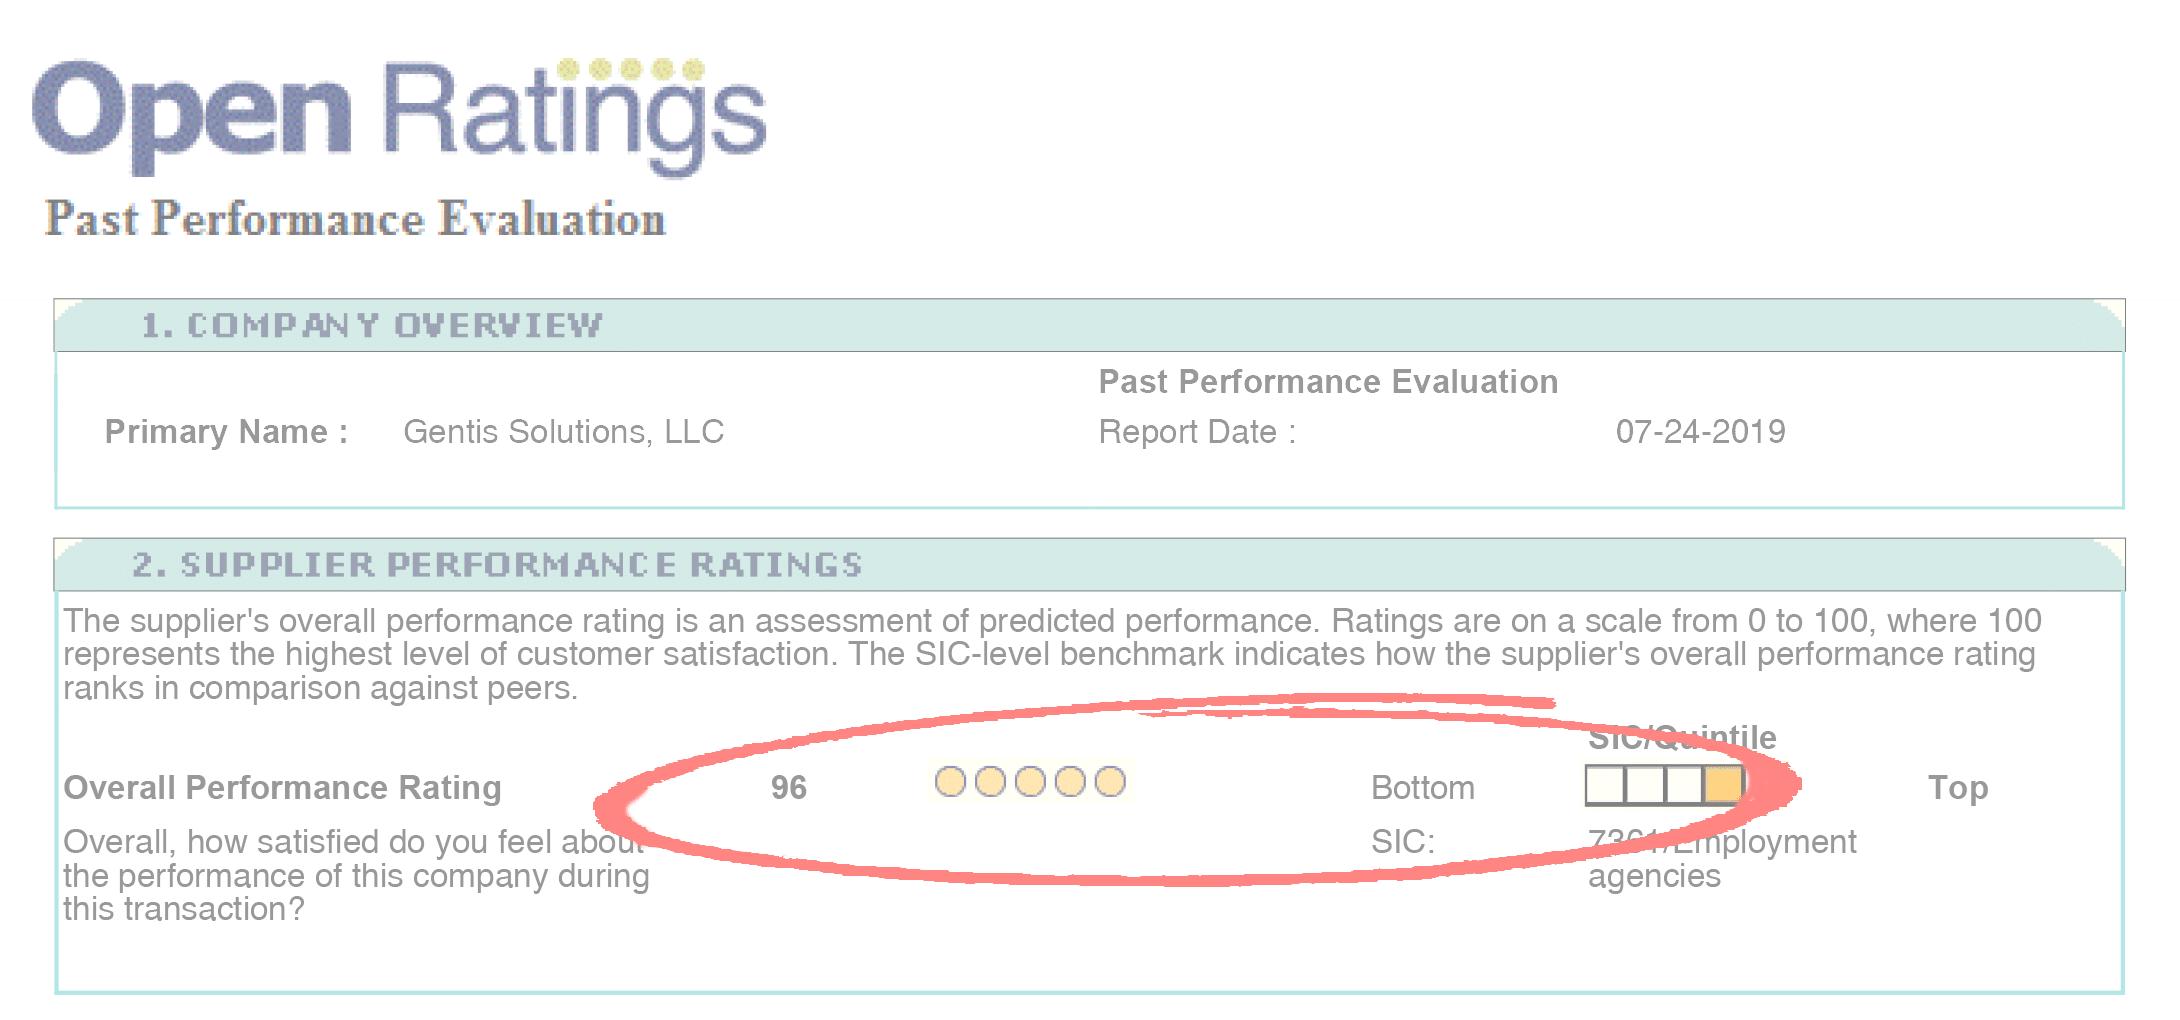 Independent Performance Survey Scores Gentis 96 of 100